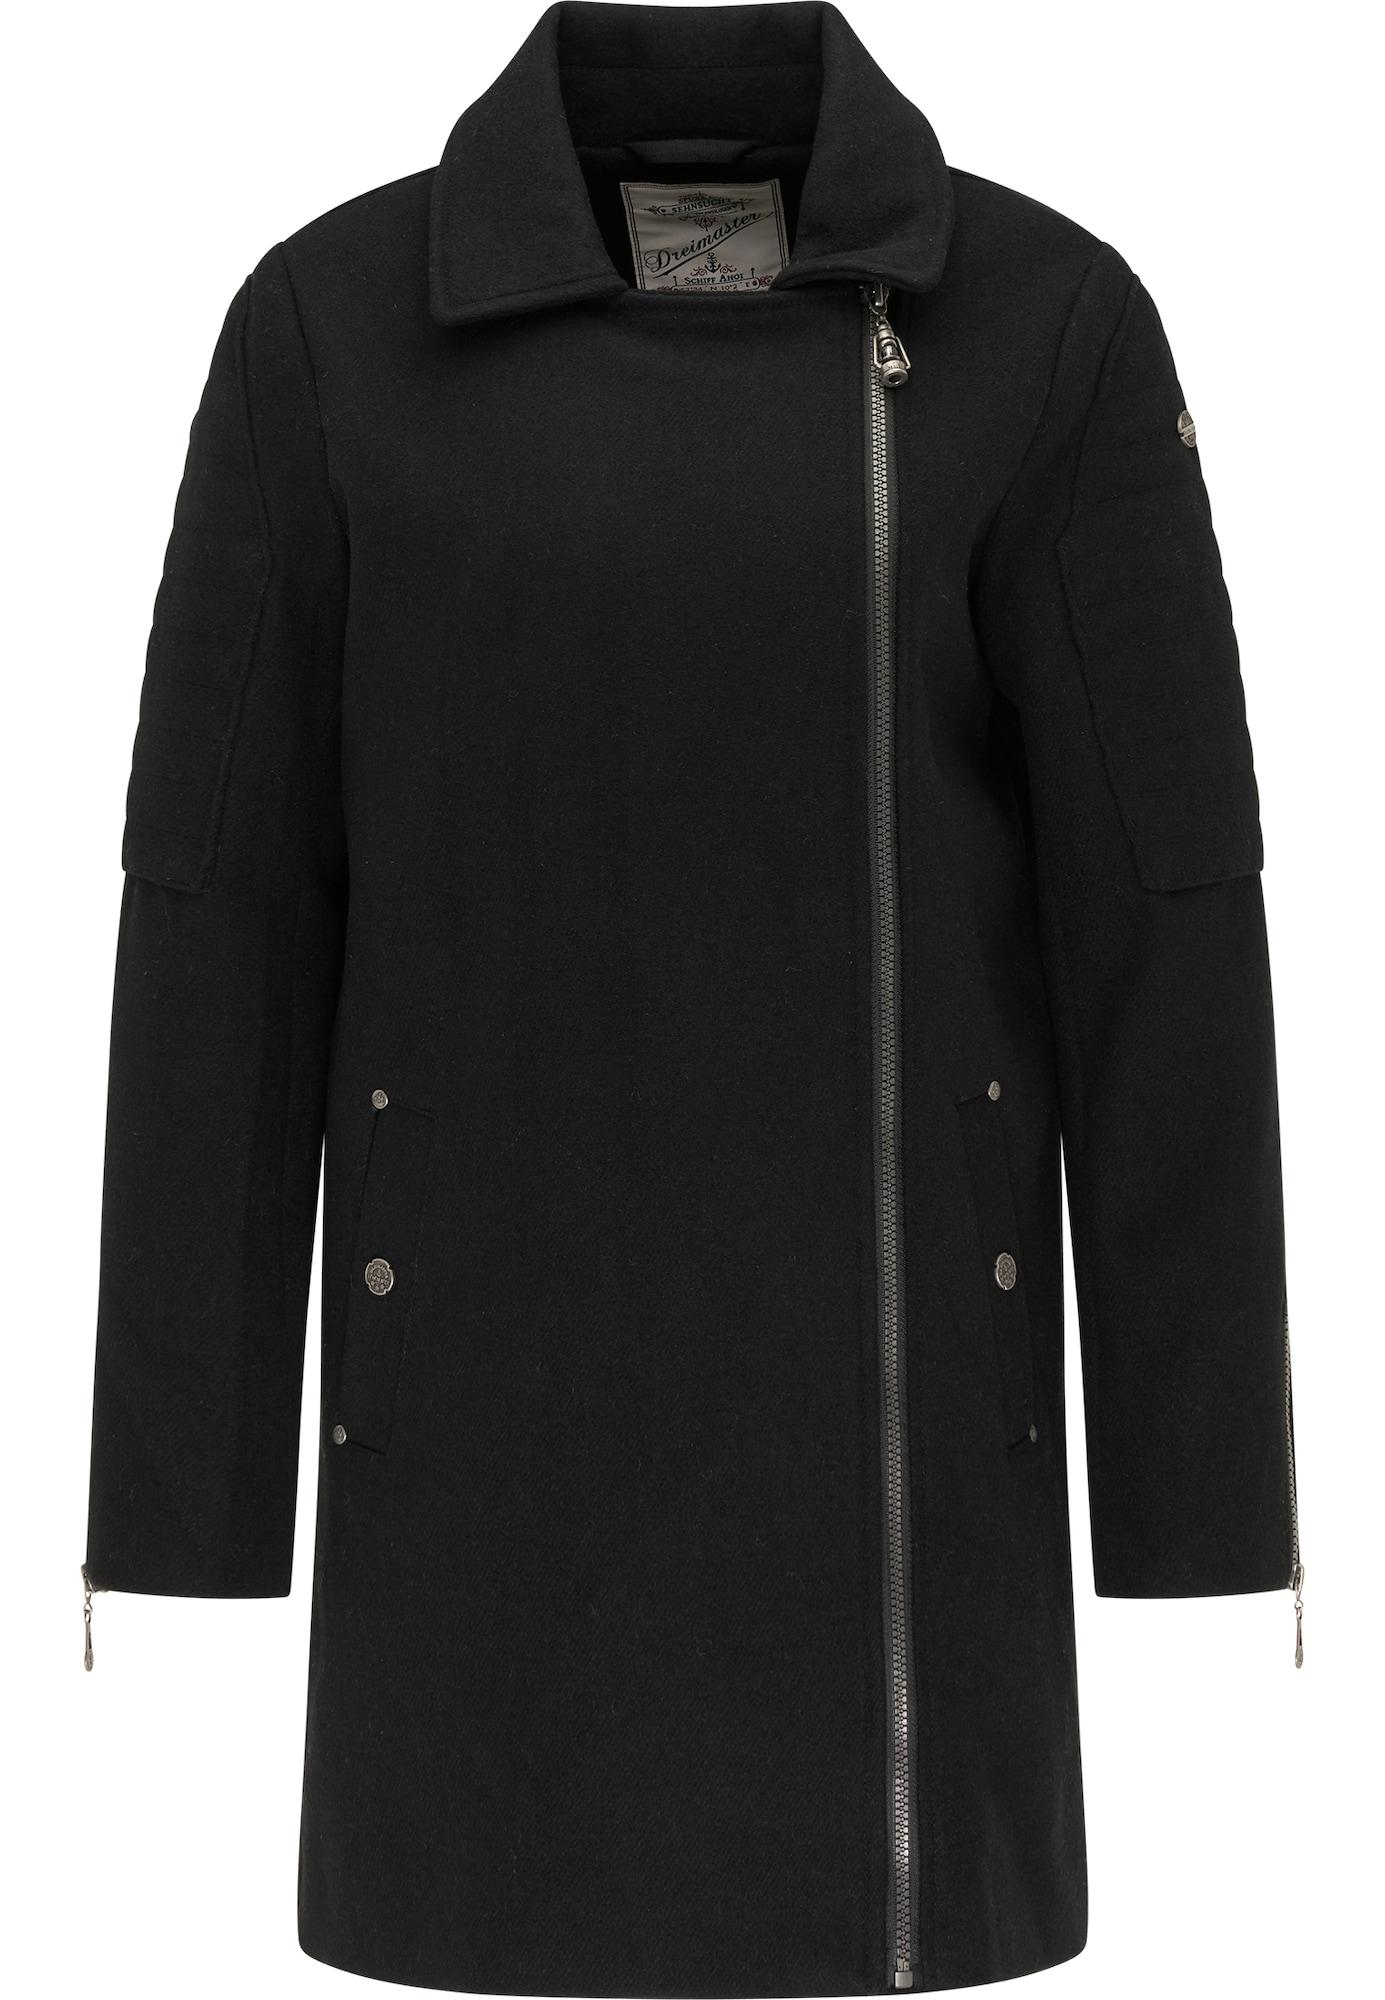 DreiMaster Vintage Demisezoninis paltas juoda